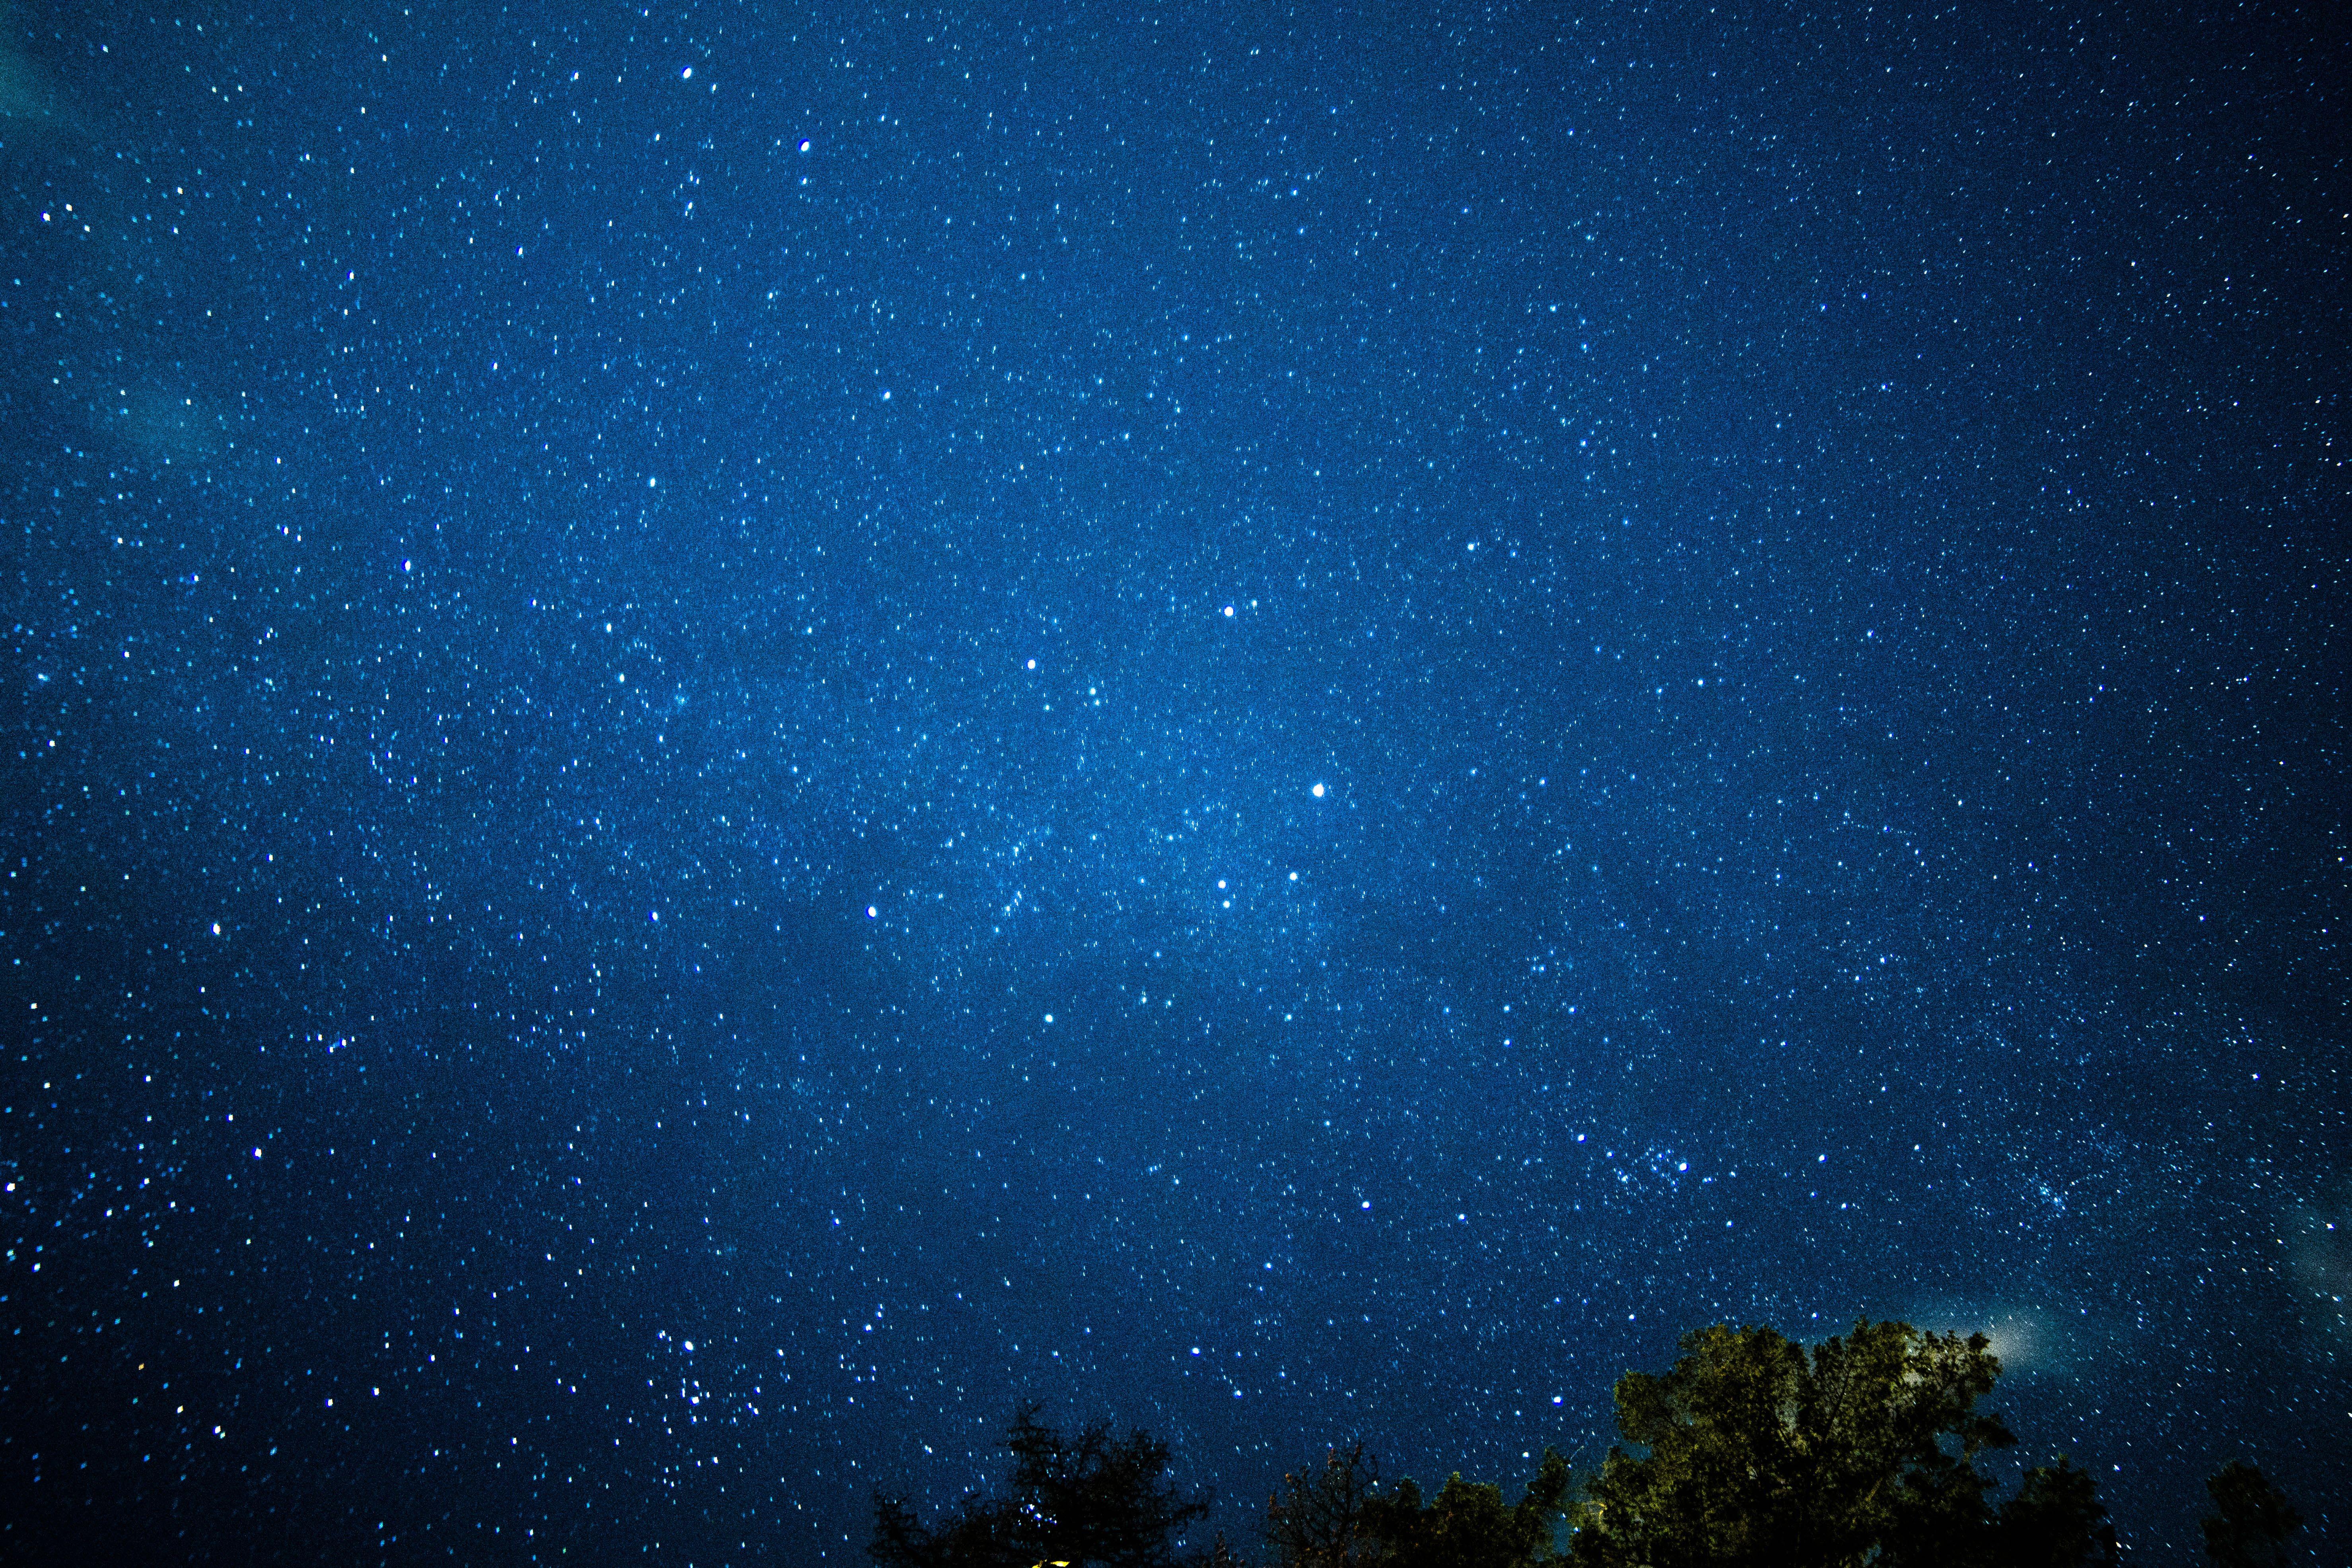 Night Astronomy Blue Sky Stars Sky Stars Night Sky Artwork Night Sky Photos Night Sky Art